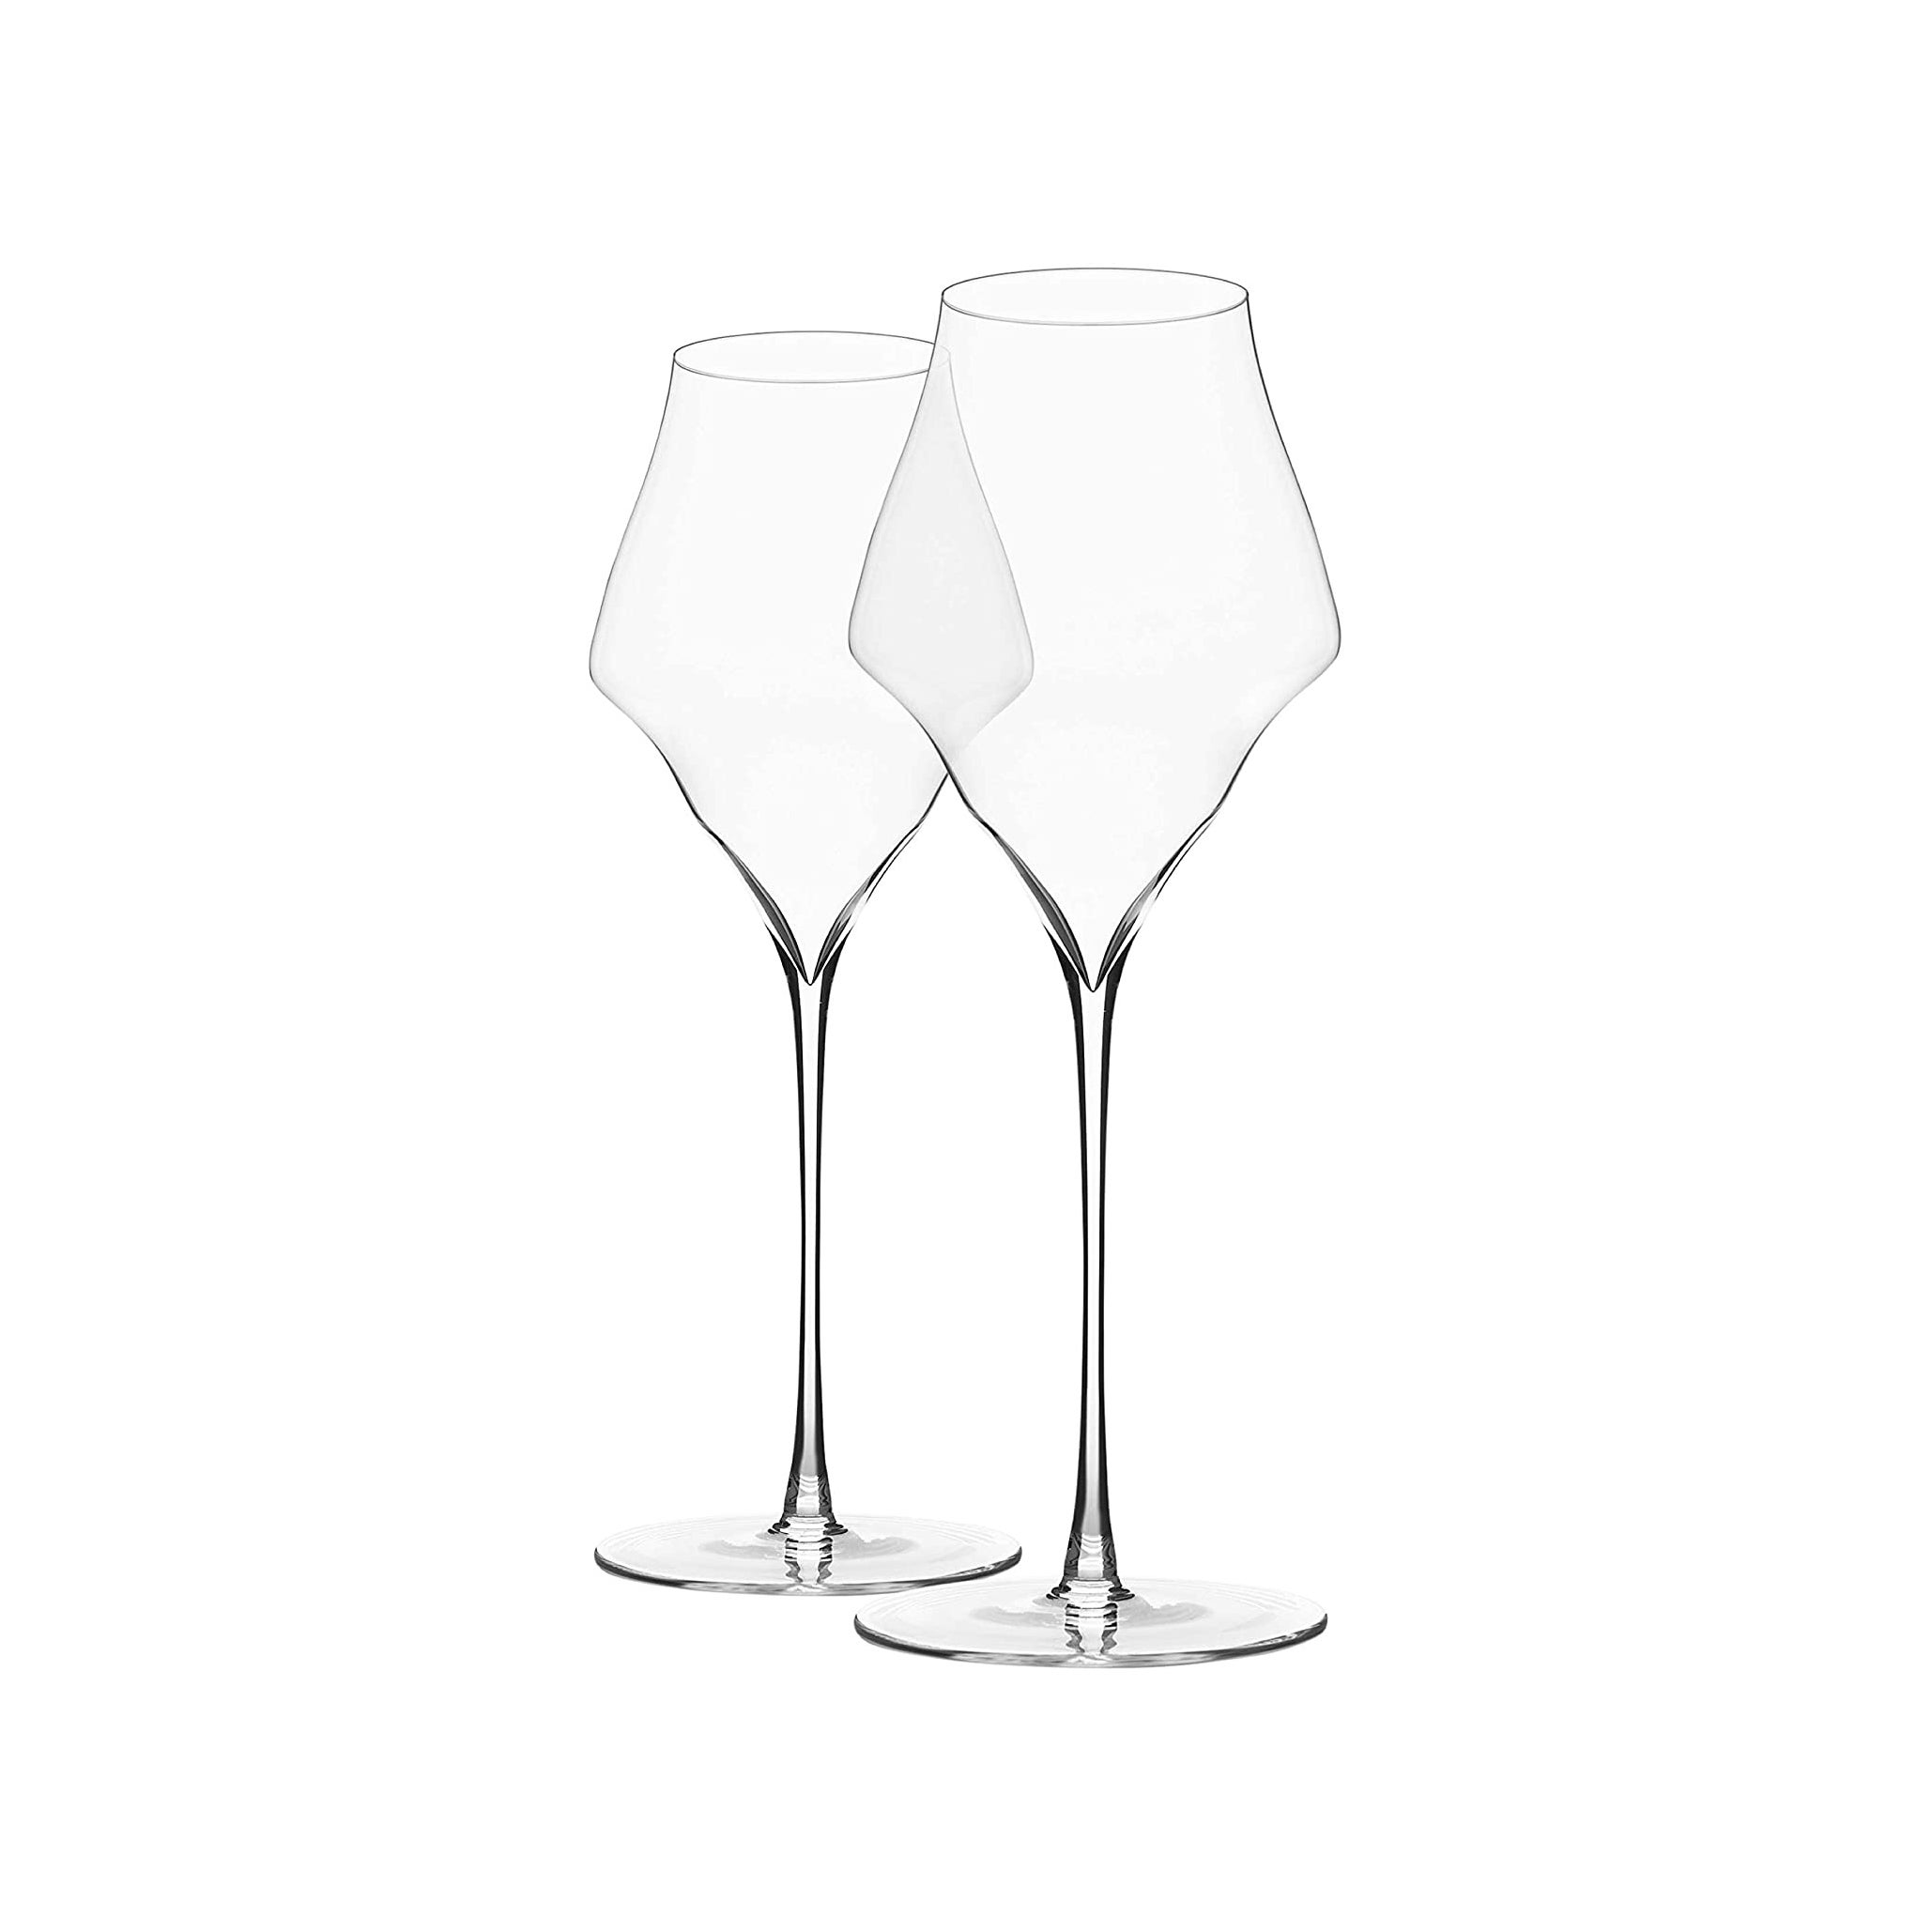 Best Best Champagne Glasses Option: Josephine No. 4 Champagne Glass